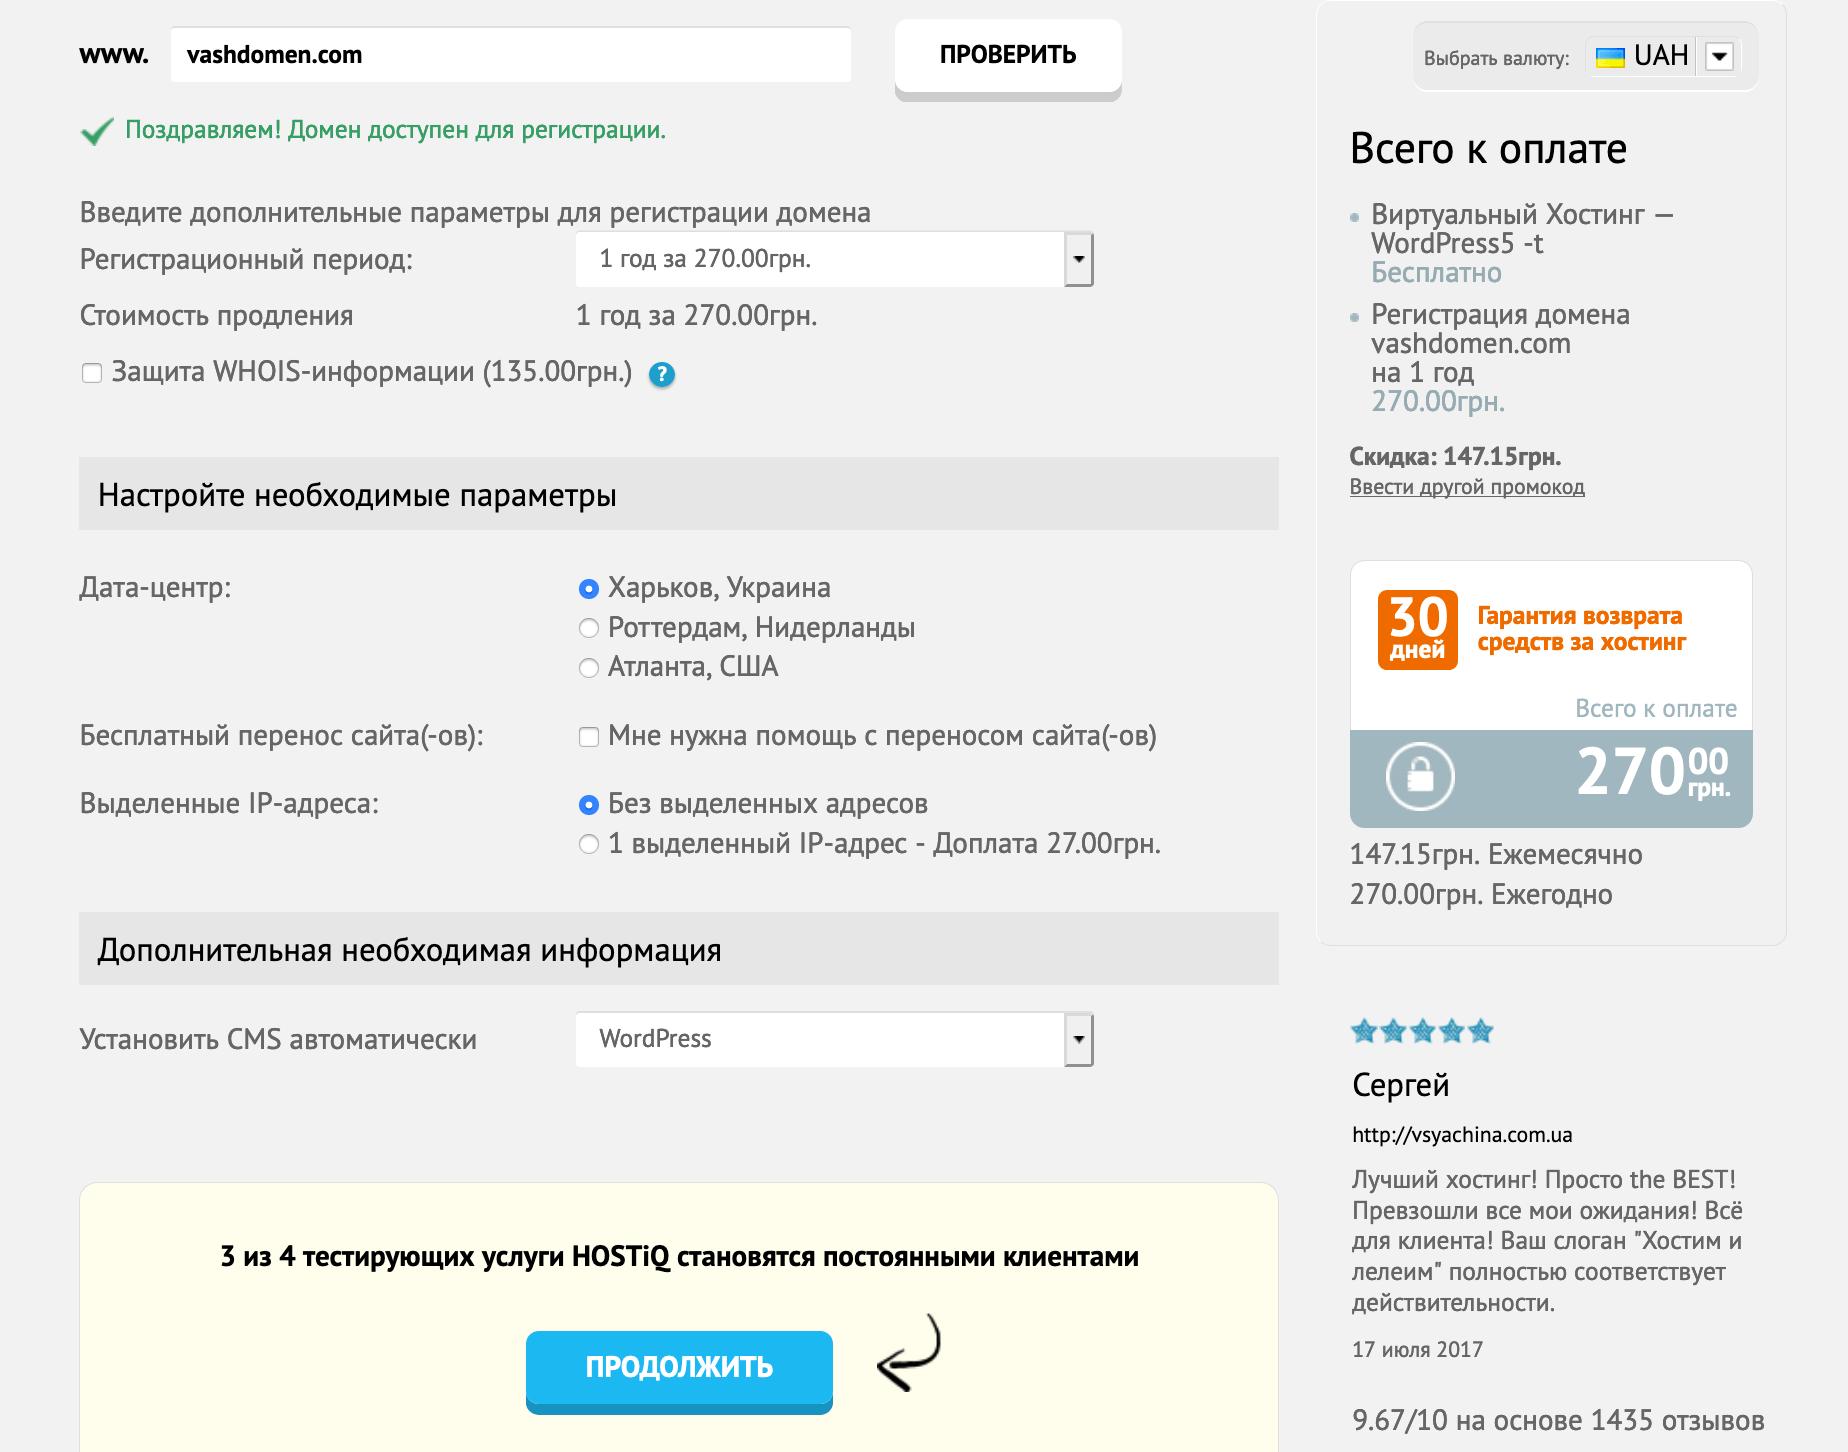 Заполнение формы заказа WordPress-хостинга на hostiq.ua